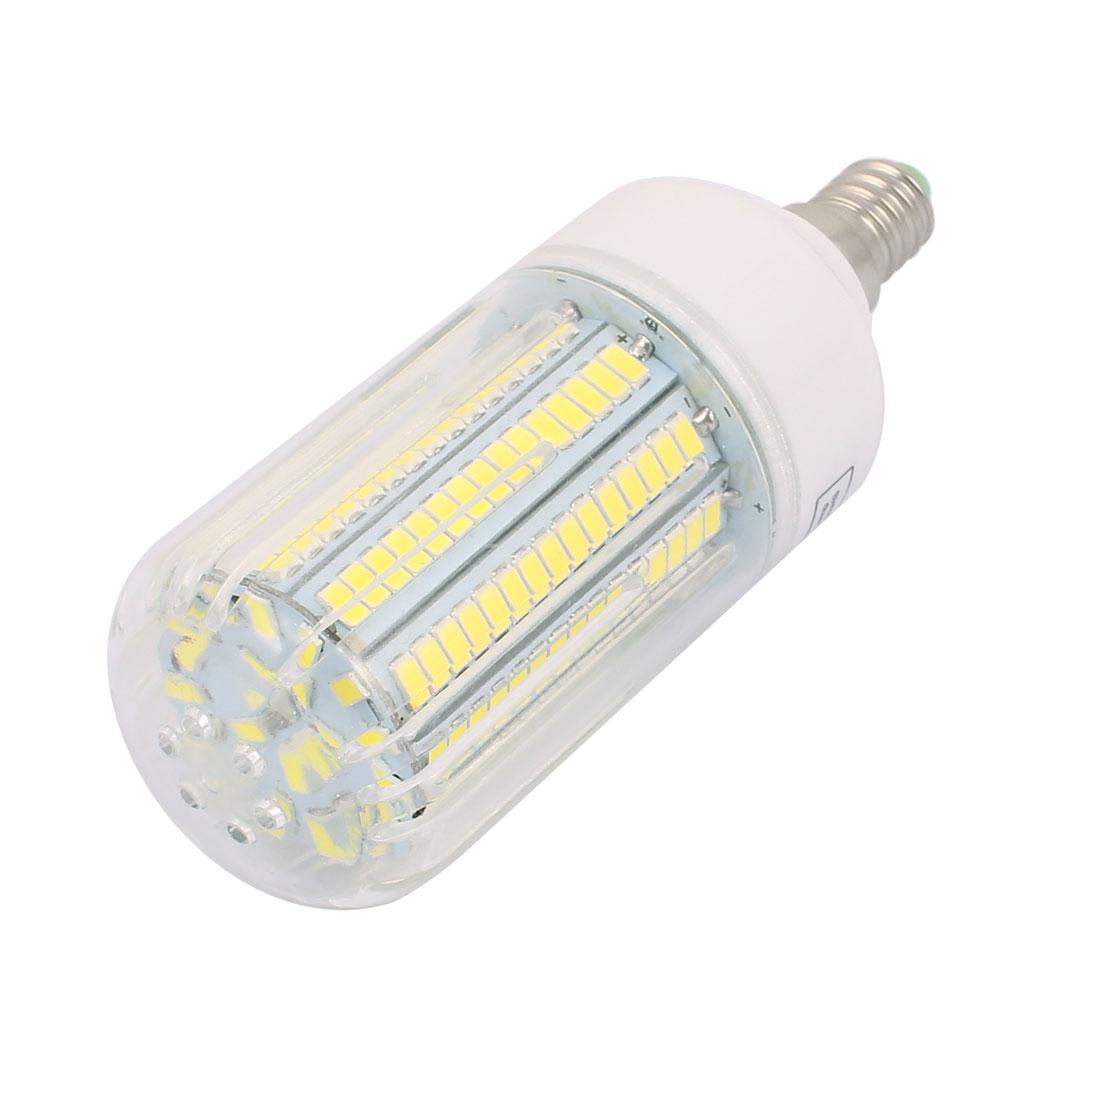 AC110V 15W 165 x 5736SMD E14 LED Corn Bulb Light Lamp Energy Saving Pure White